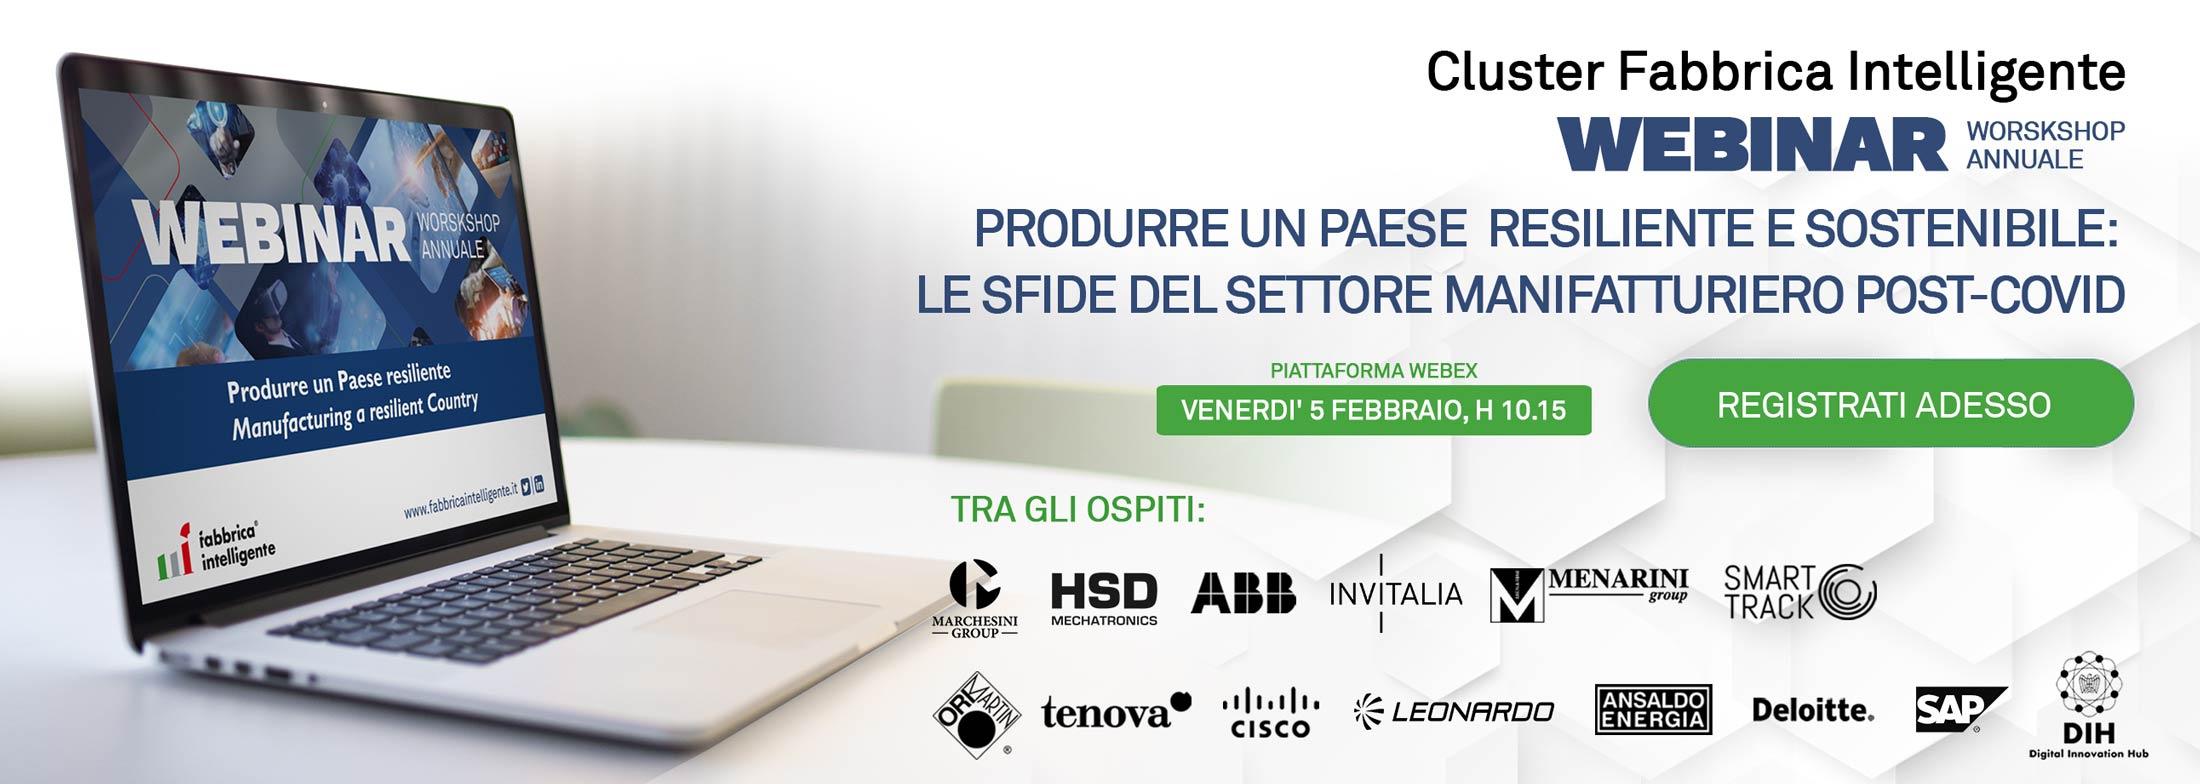 Workshop annuale del Cluster Fabbrica Intelligente